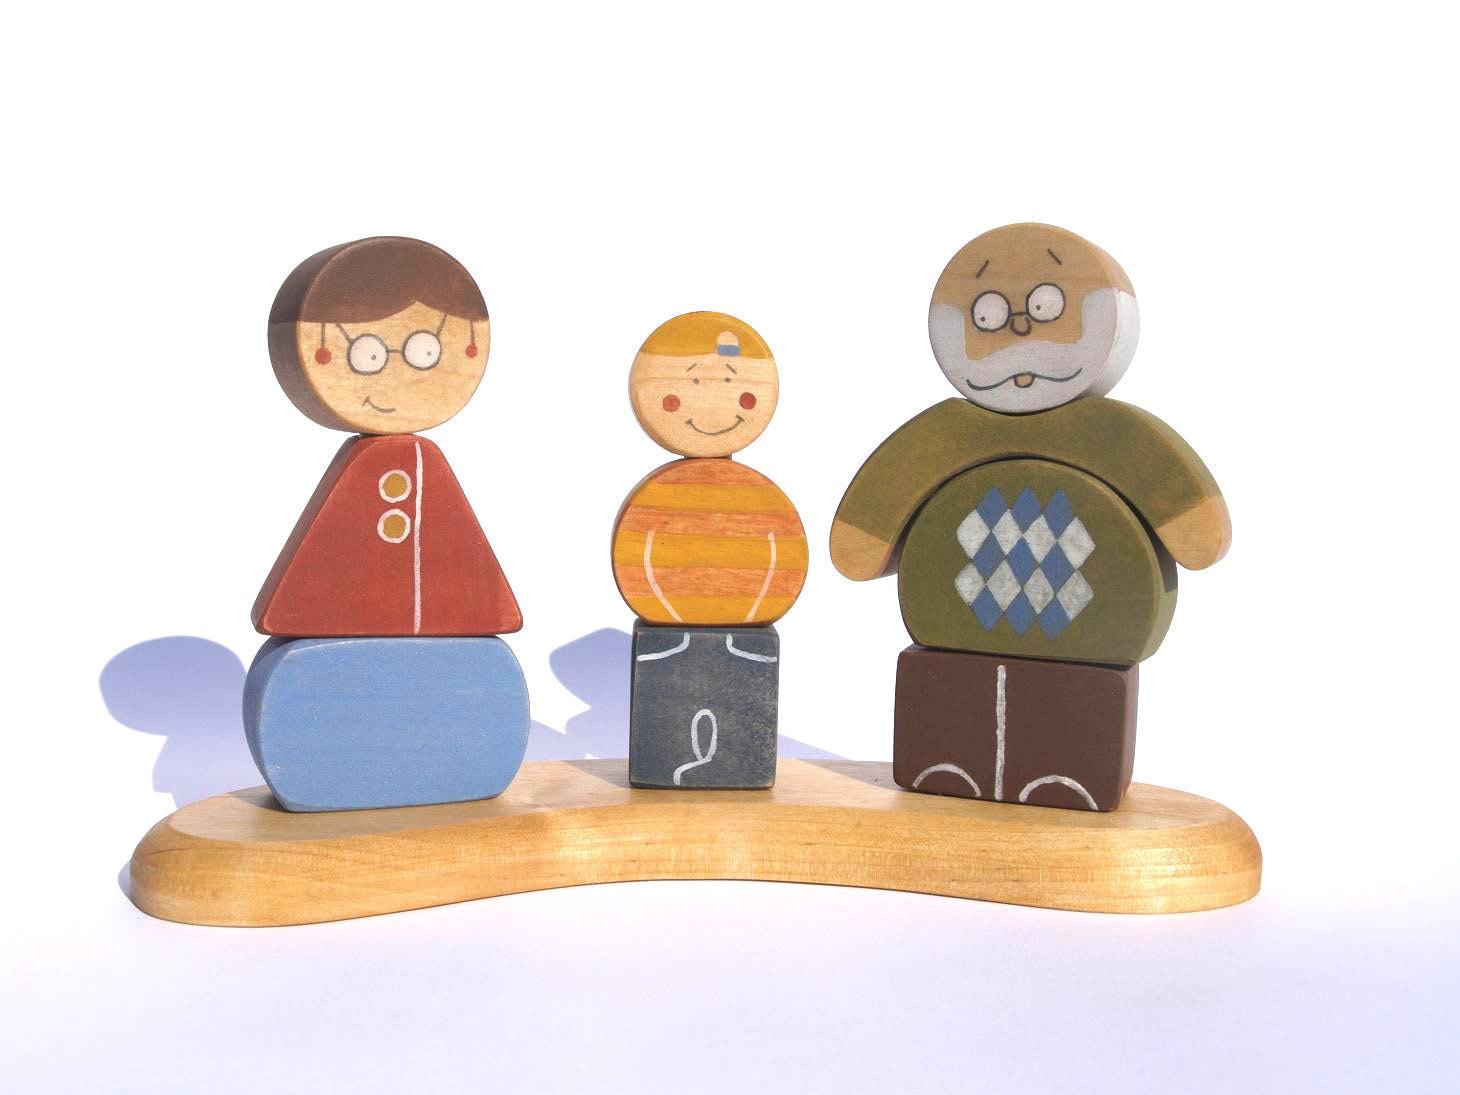 Trina S Trinketts Etsy Finds Friday Friendly Toys